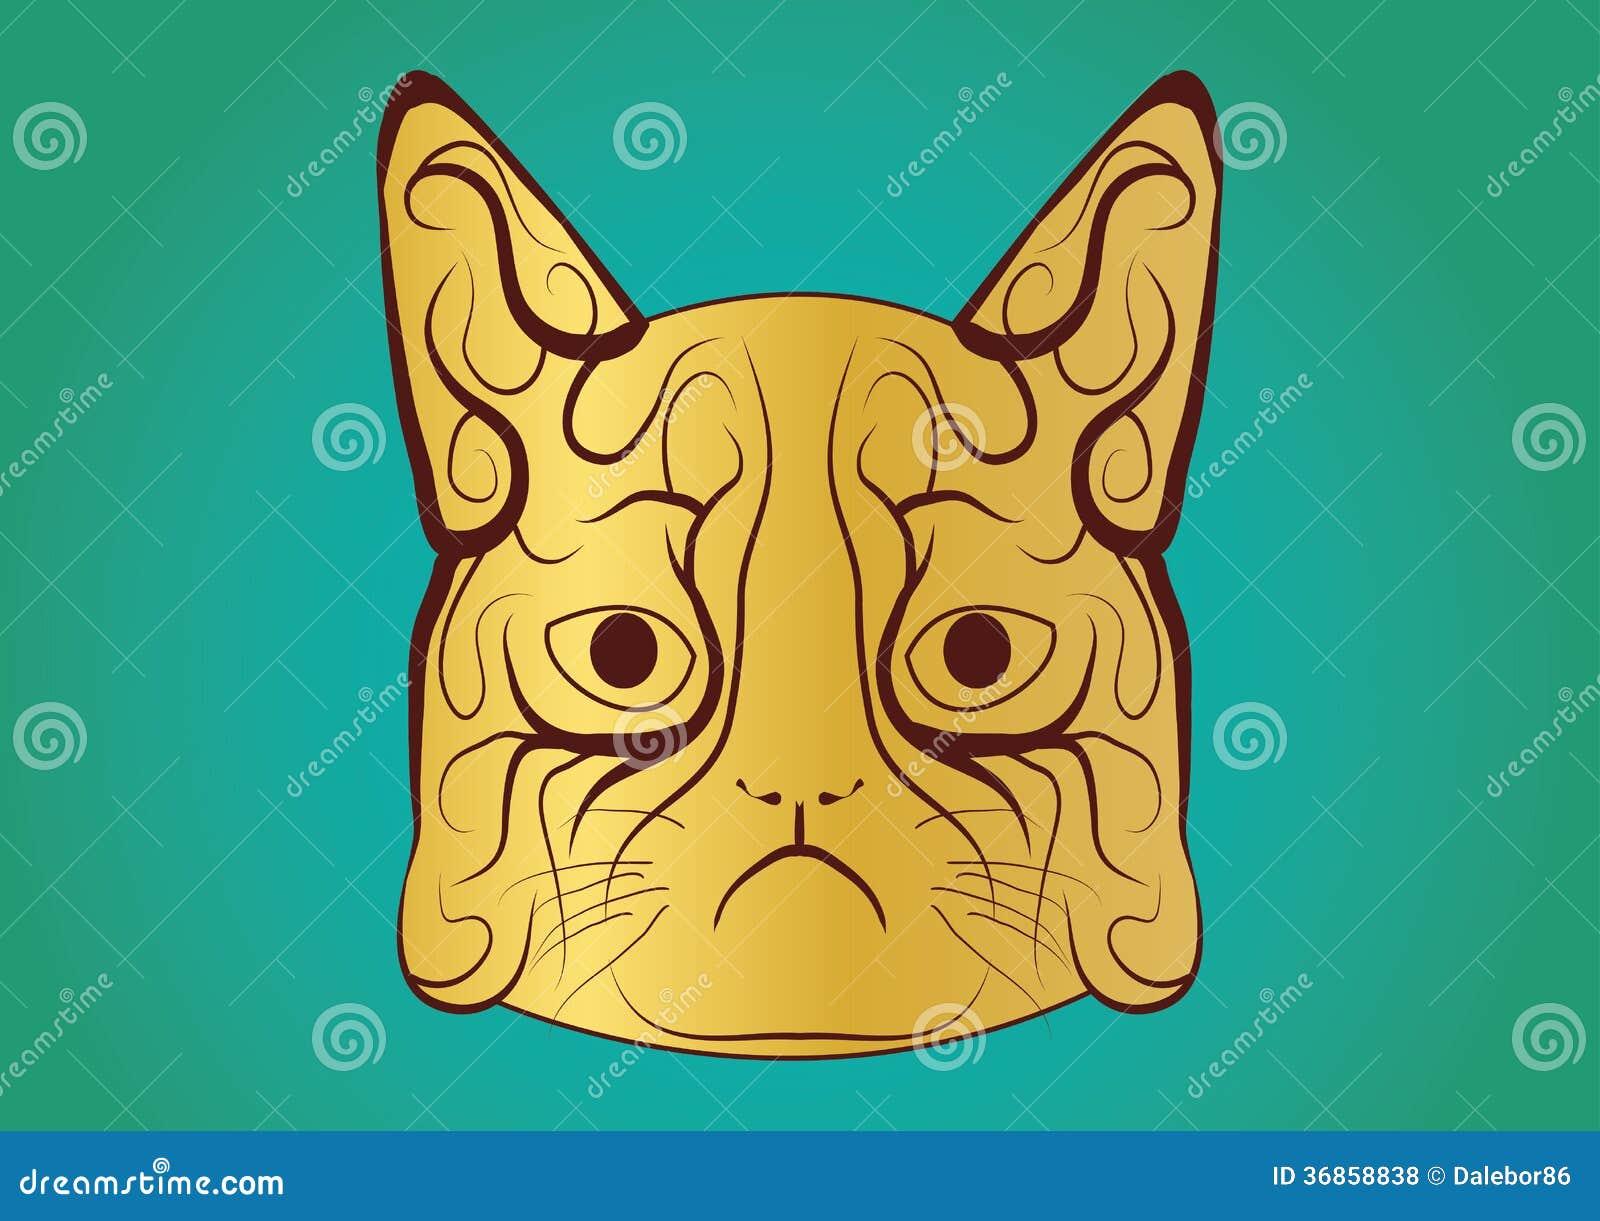 Gderliwy kot